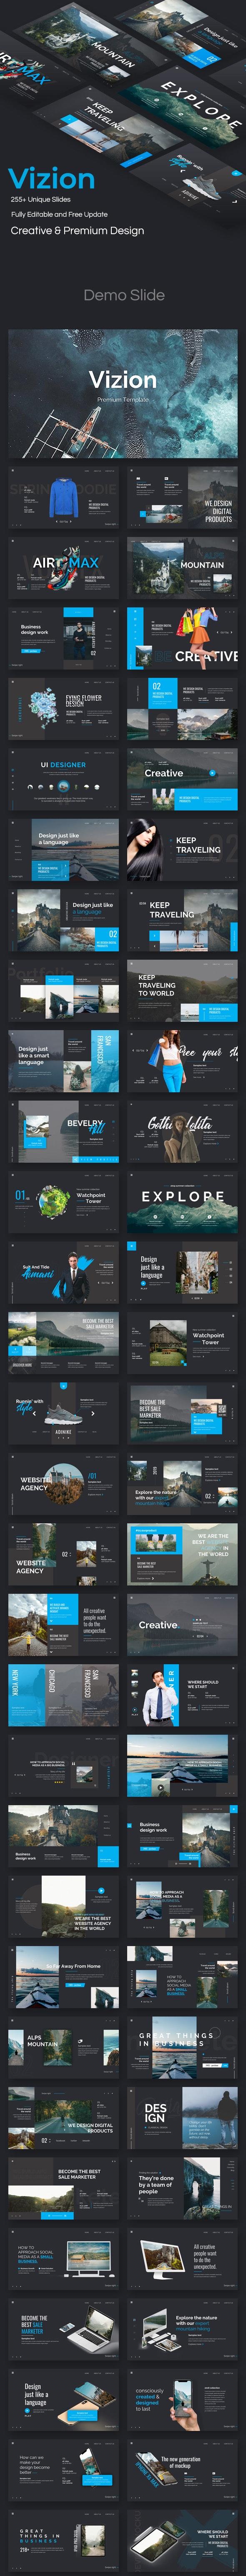 Vizion Premium Google Slide Template - Google Slides Presentation Templates